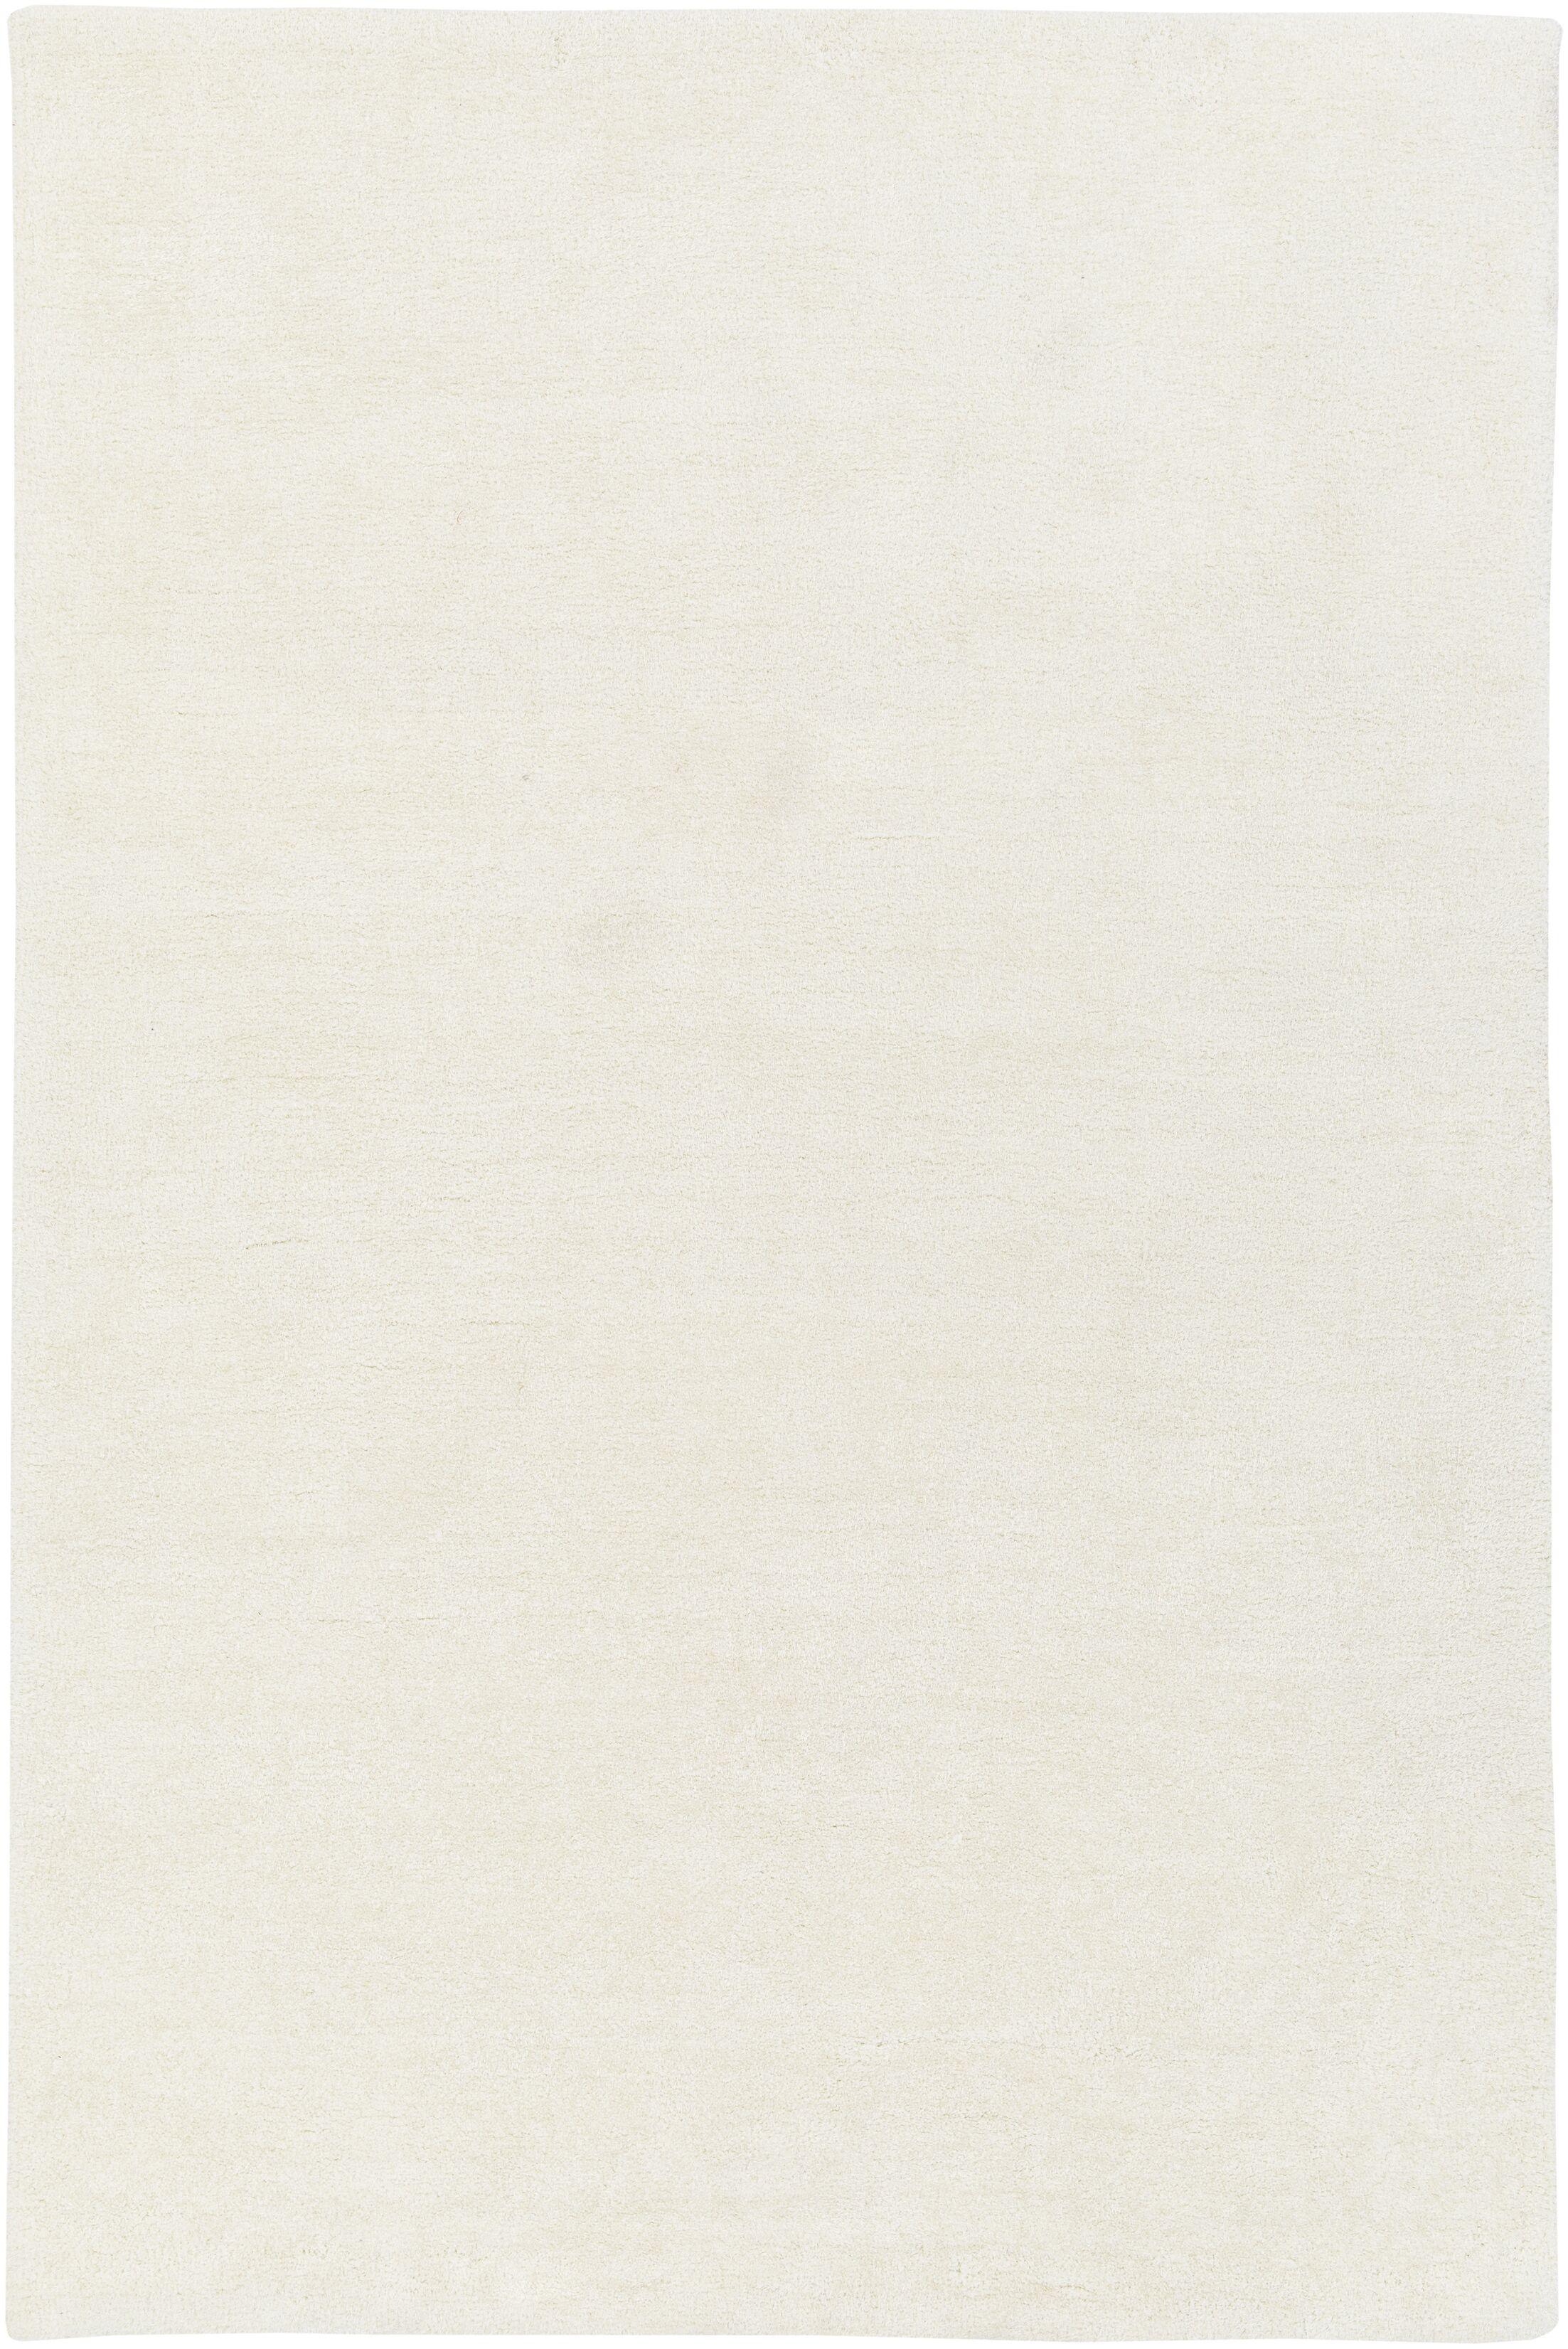 Eckman Ivory Area Rug Rug Size: Rectangle 5' x 7'6